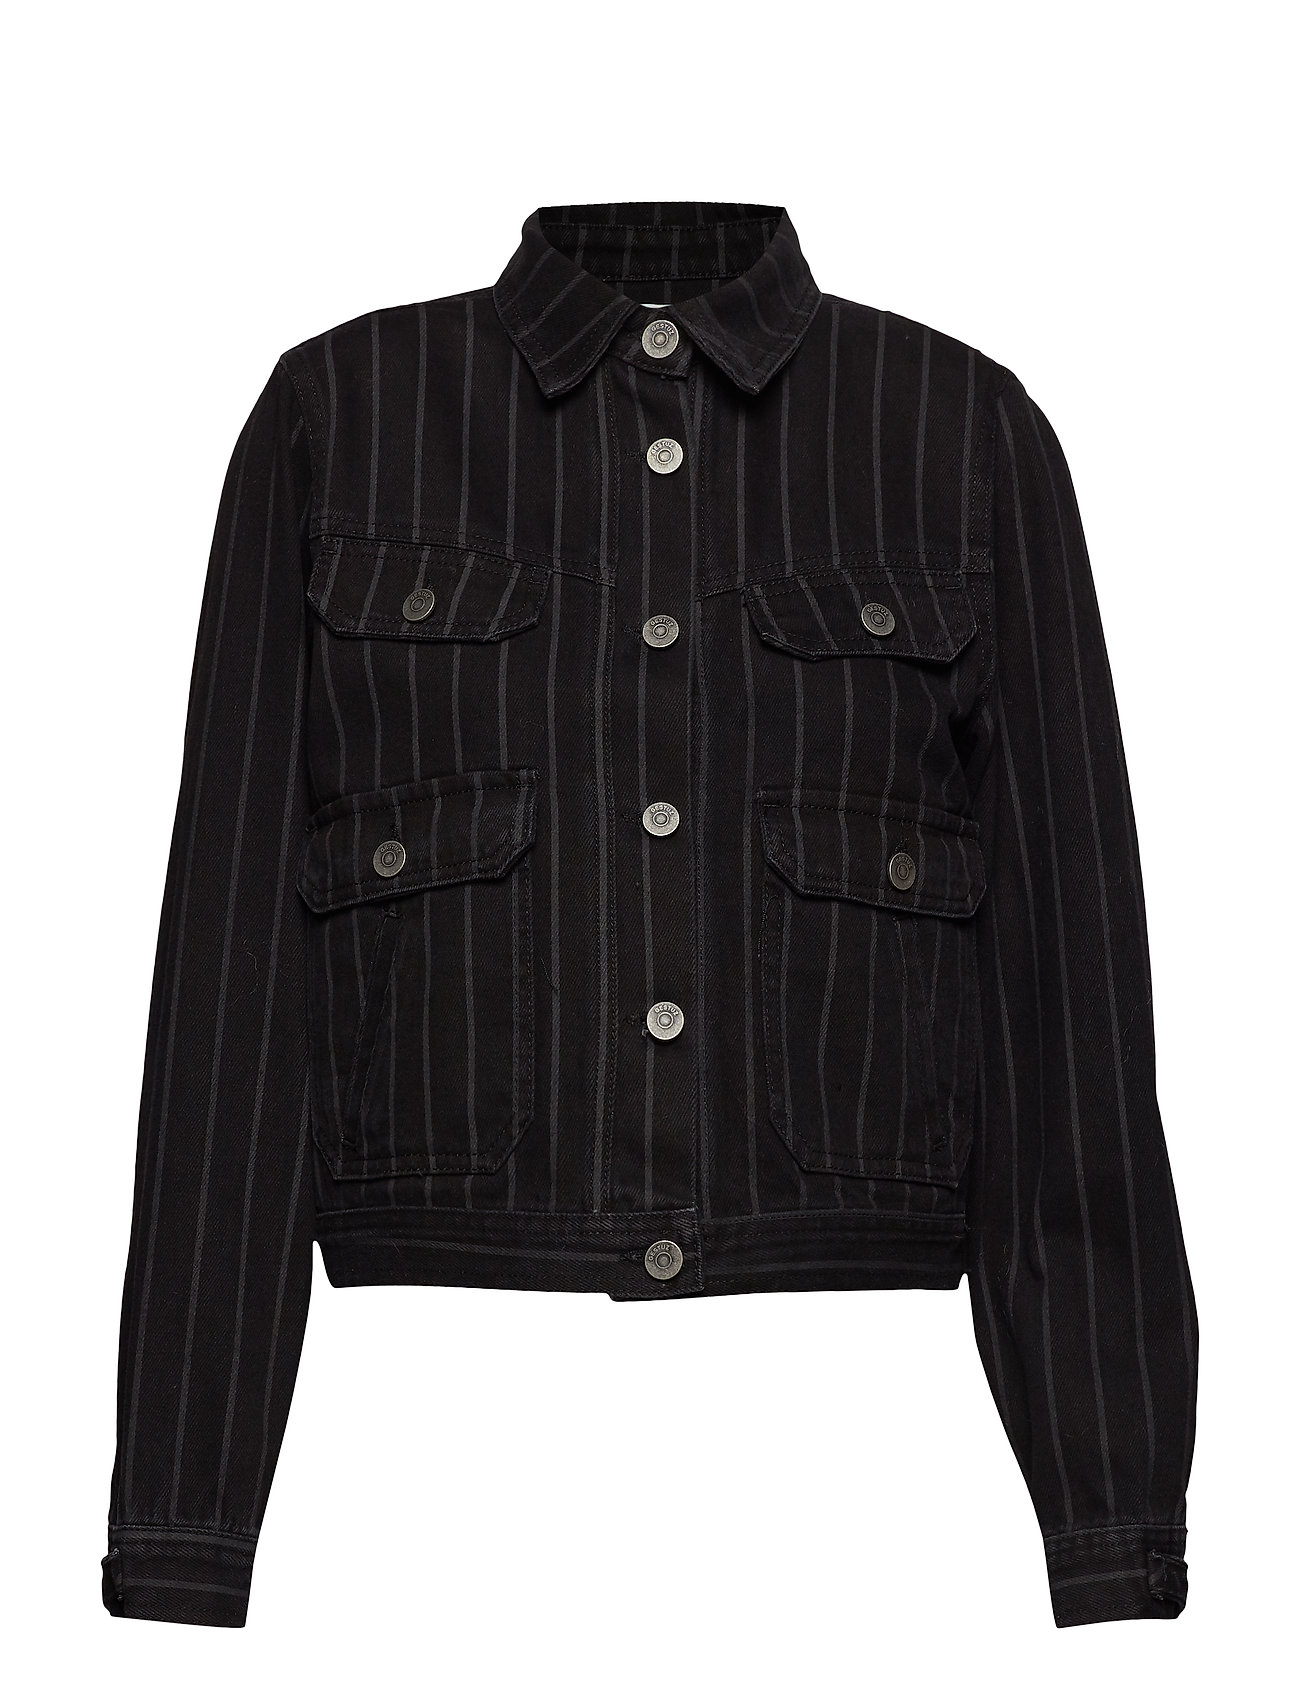 Gestuz Emma jacket SO19 - BLACK PINSTRIPE